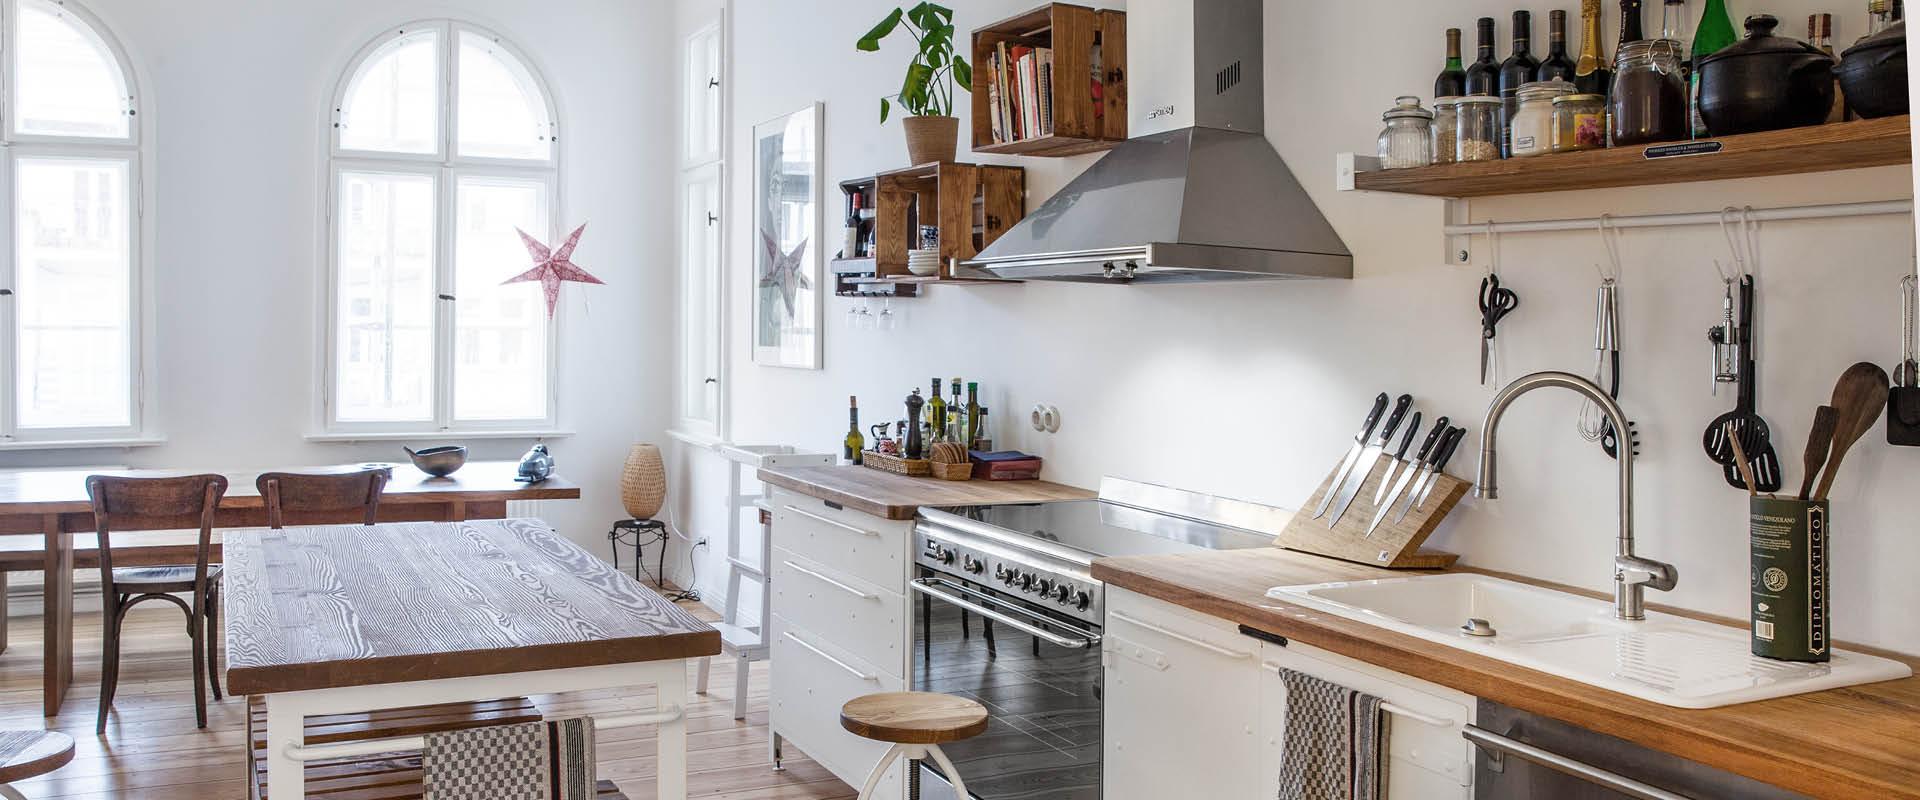 Authentic Kitchen   Küchenstudio & Showroom in Berlin Mitte